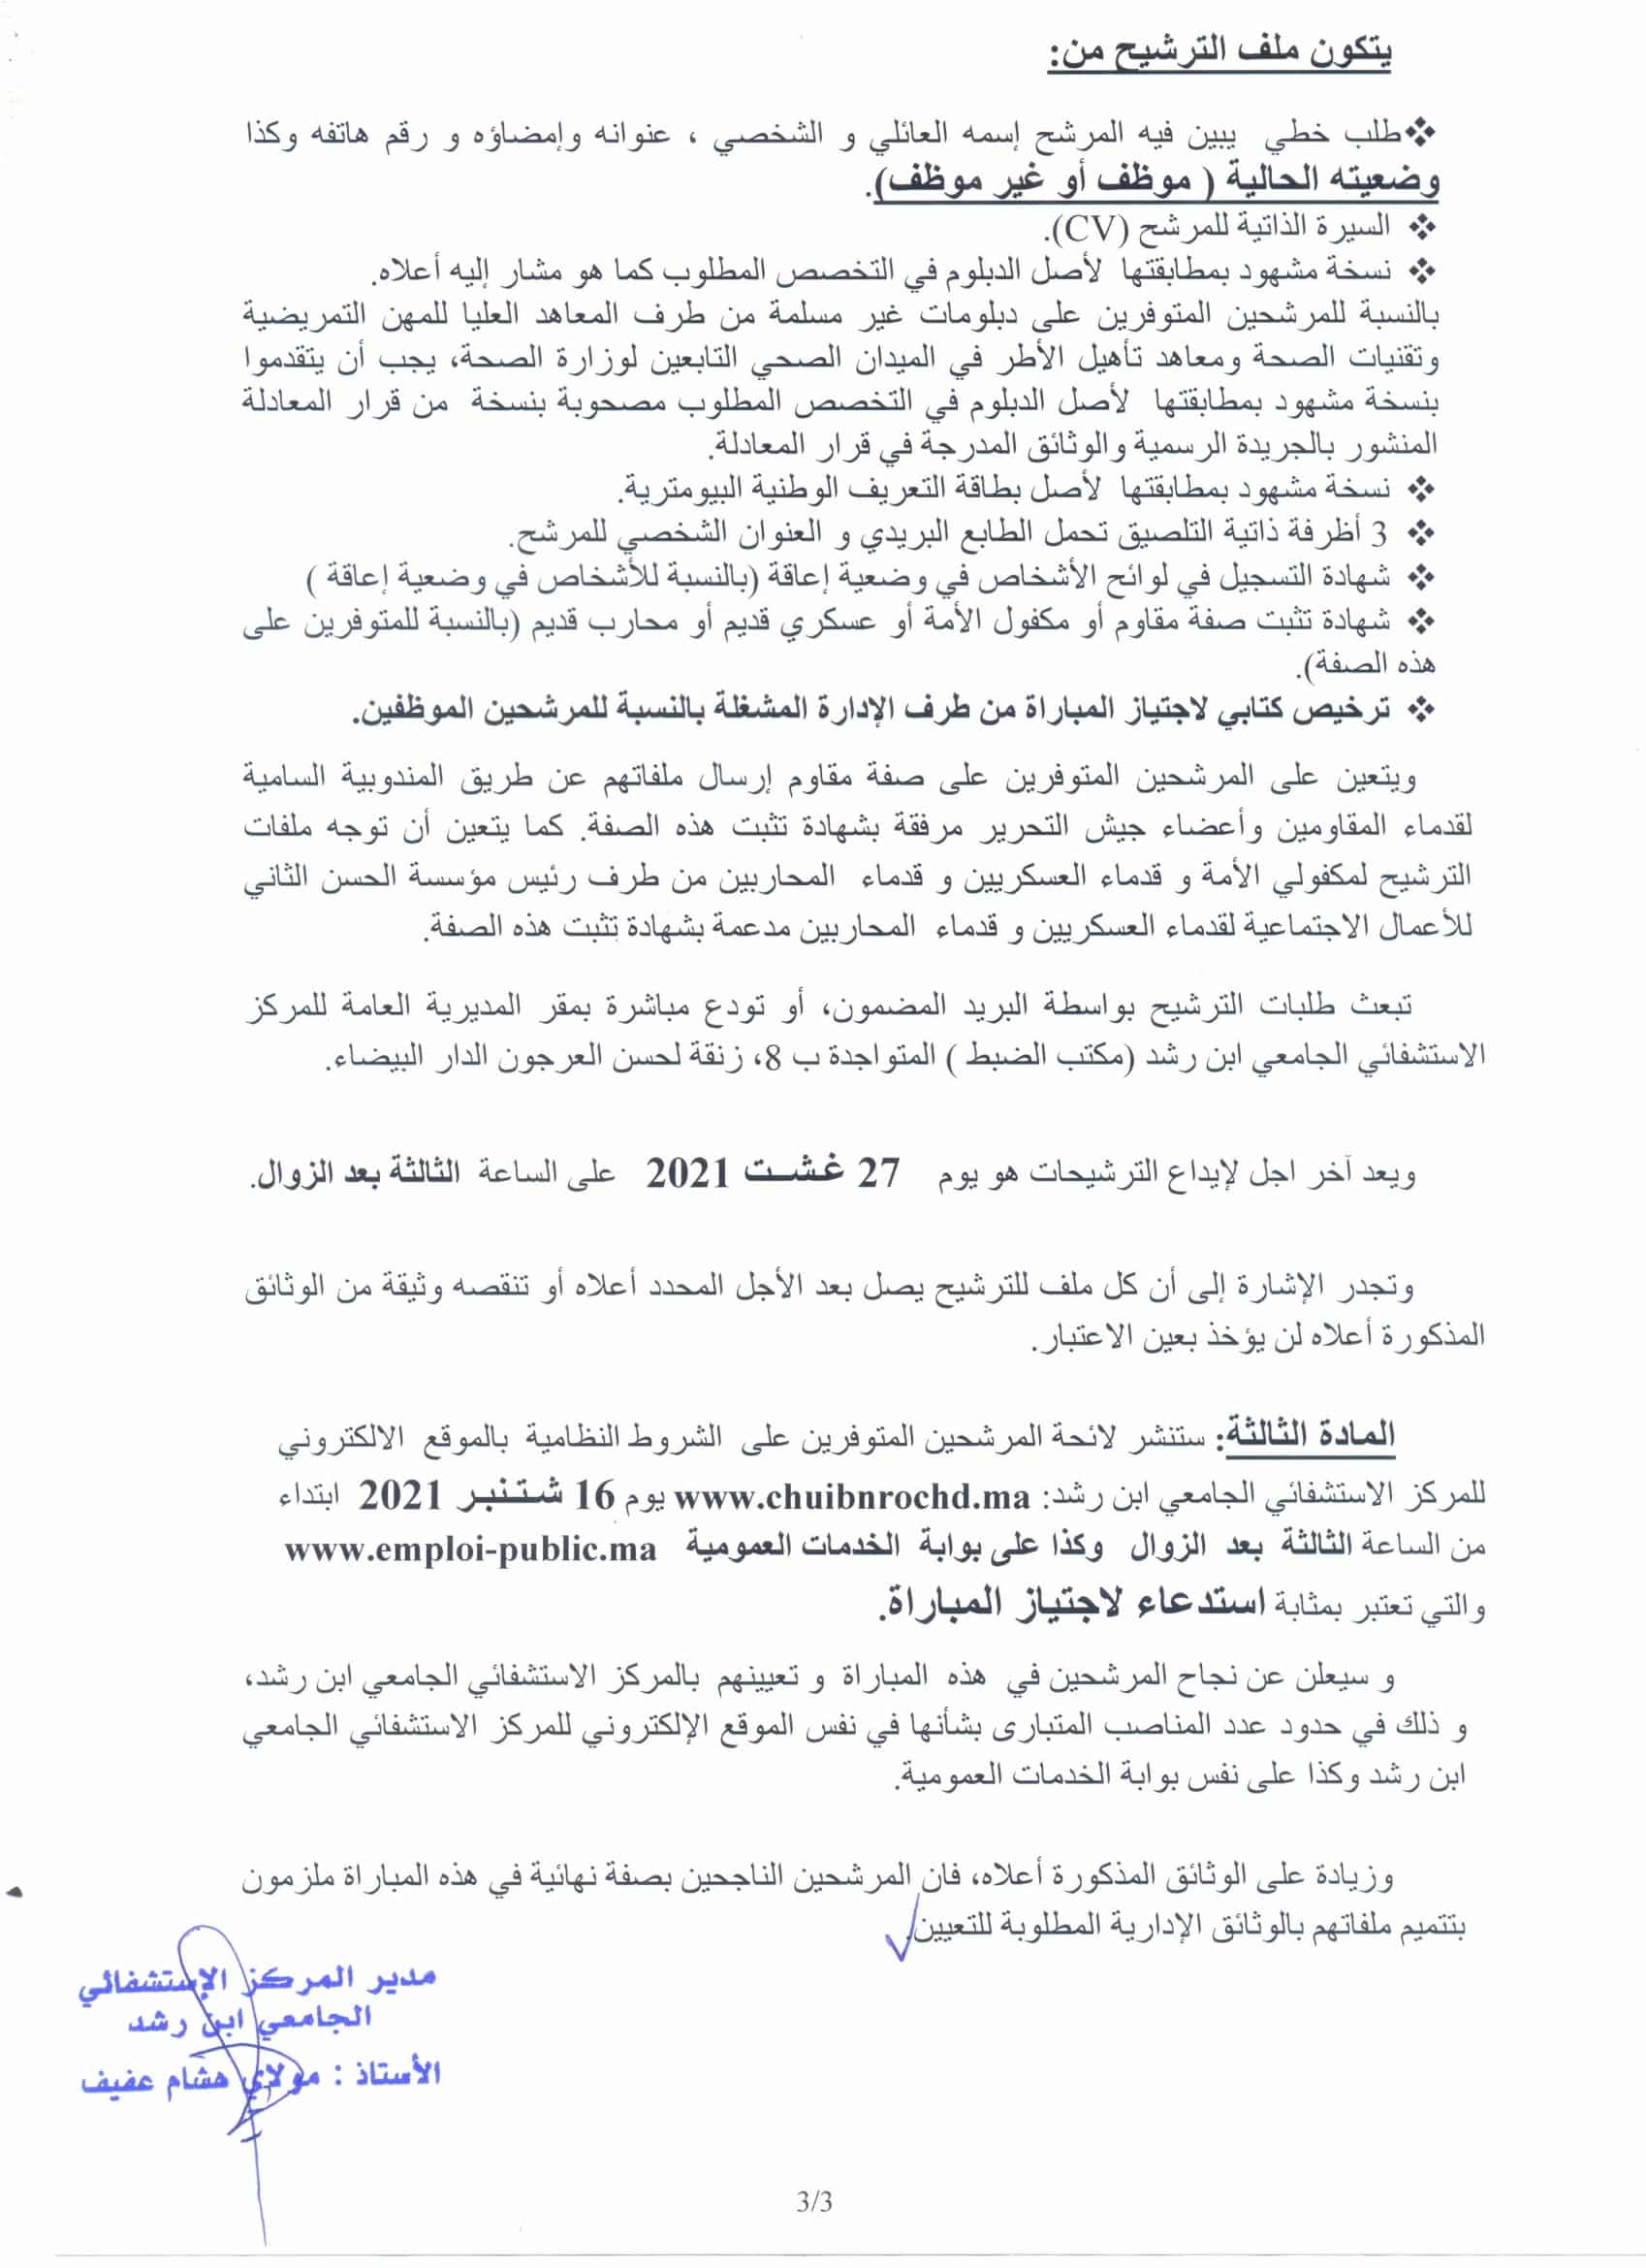 RECRUTINF1992021 3 Concours de Recrutement CHU Ibn Rochd 2021 (156 Postes)